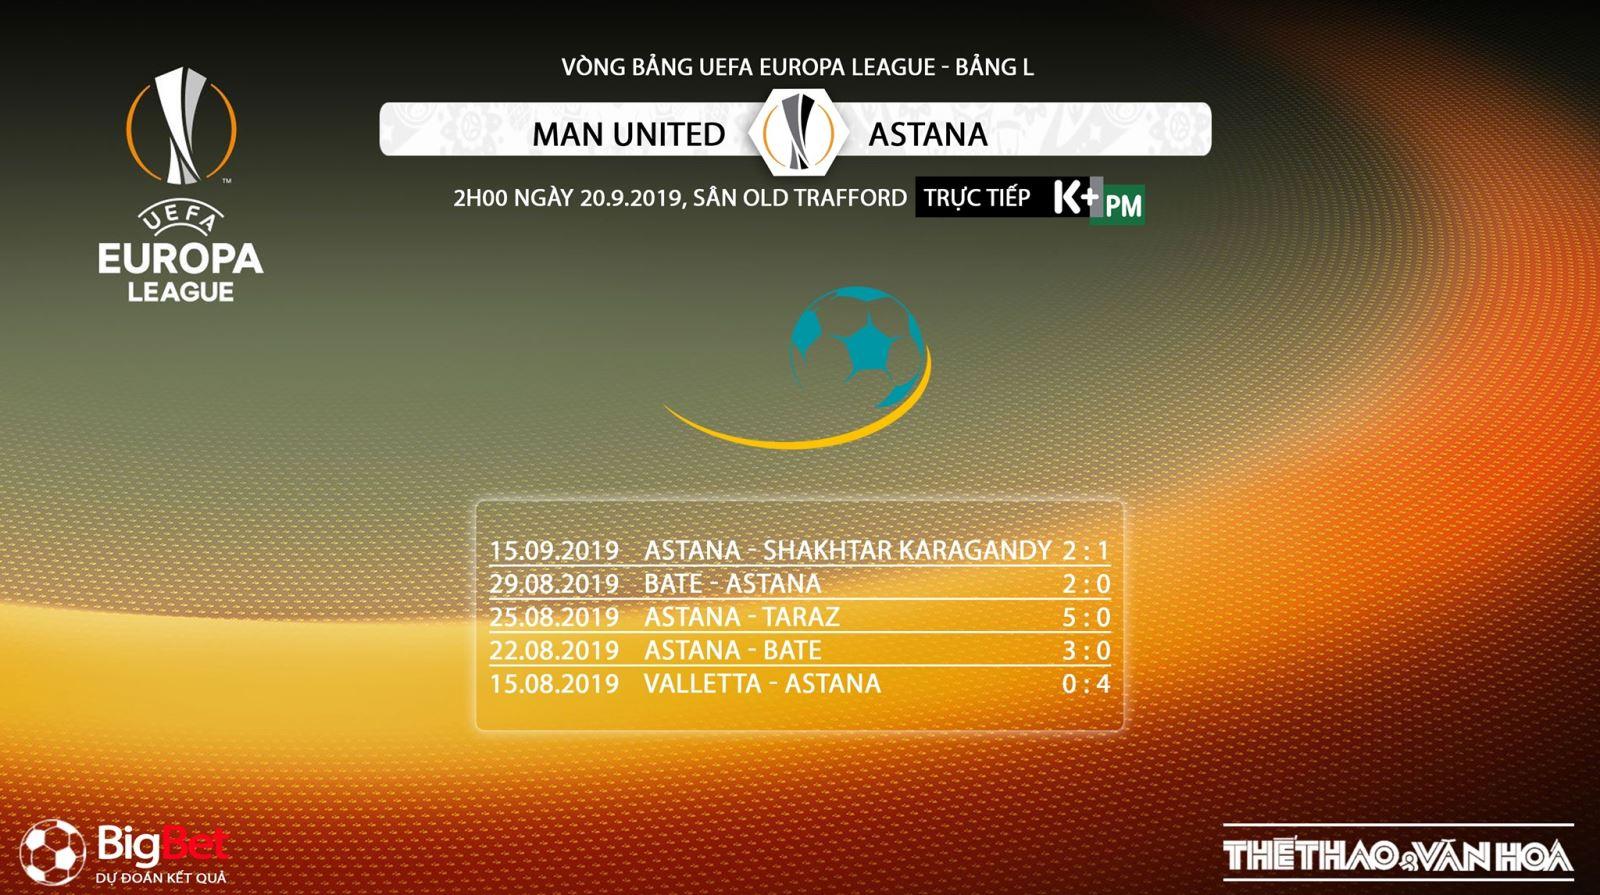 soi keo bong da, MU đấu với Astana, truc tiep bong da hôm nay, MU vs Astana, trực tiếp bóng dá, xem bong da truc tuyen, C1, Cúp C1, Champions League